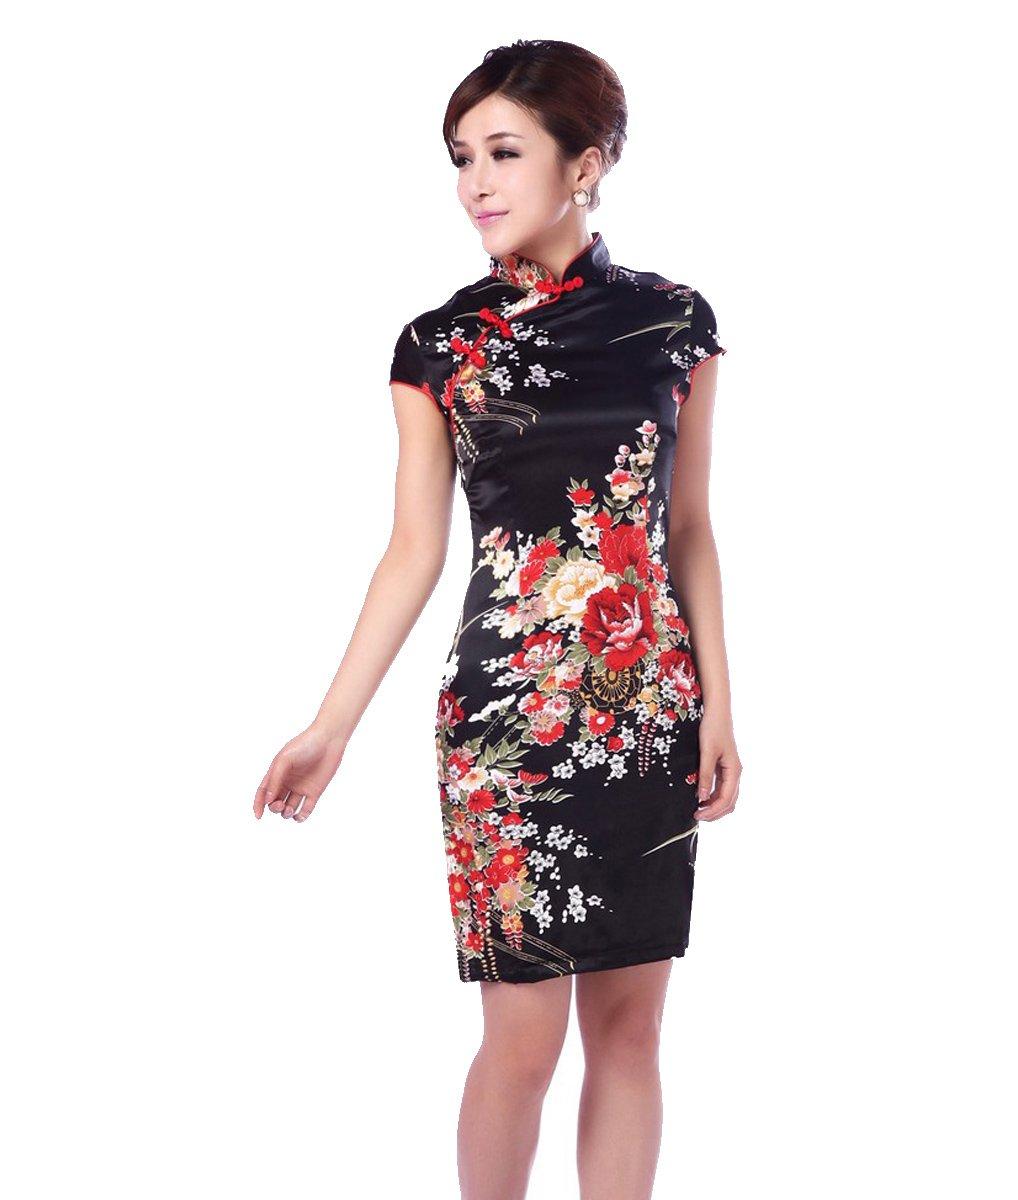 YueLian Women's Chinese Evening Cheongsam Short Qipao Dress (China XXL= US 10, Black)